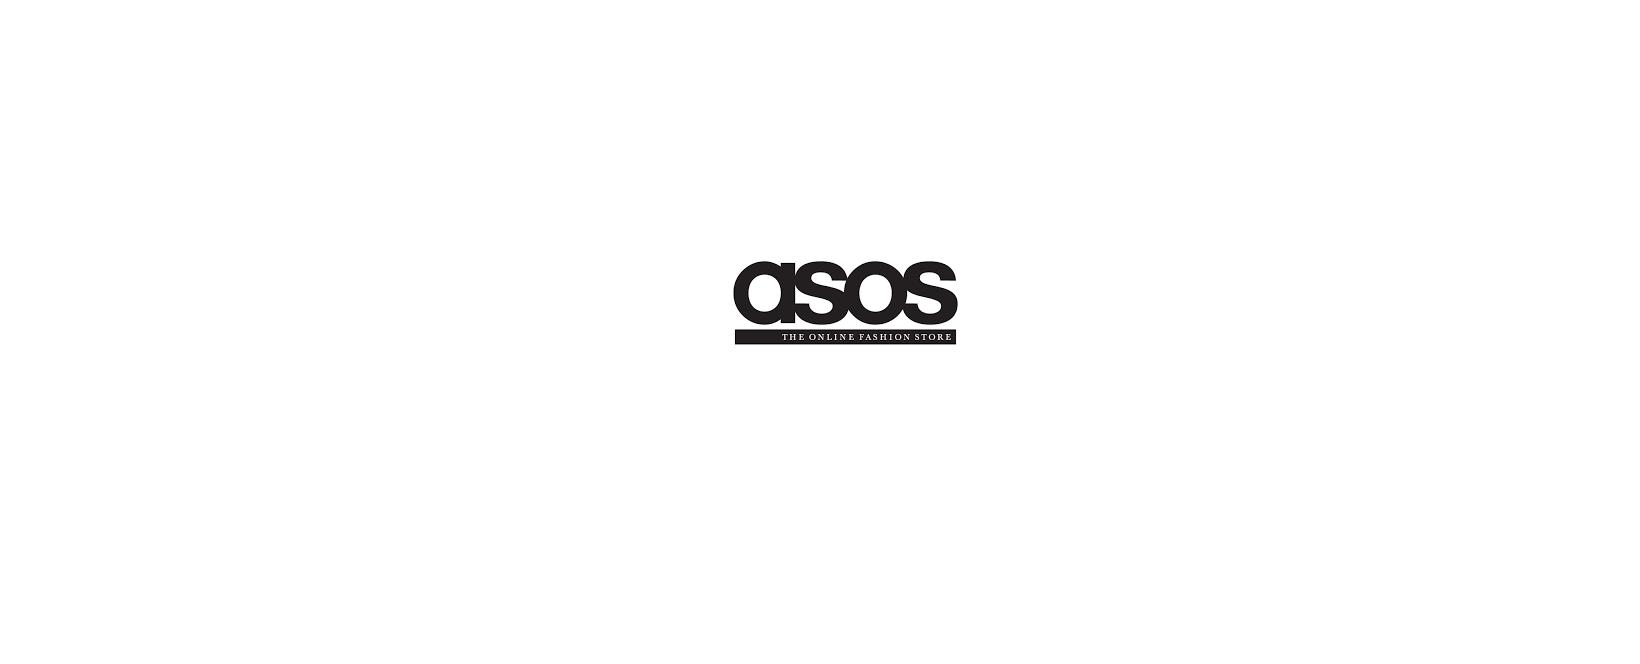 ASOS Discount Code 2021